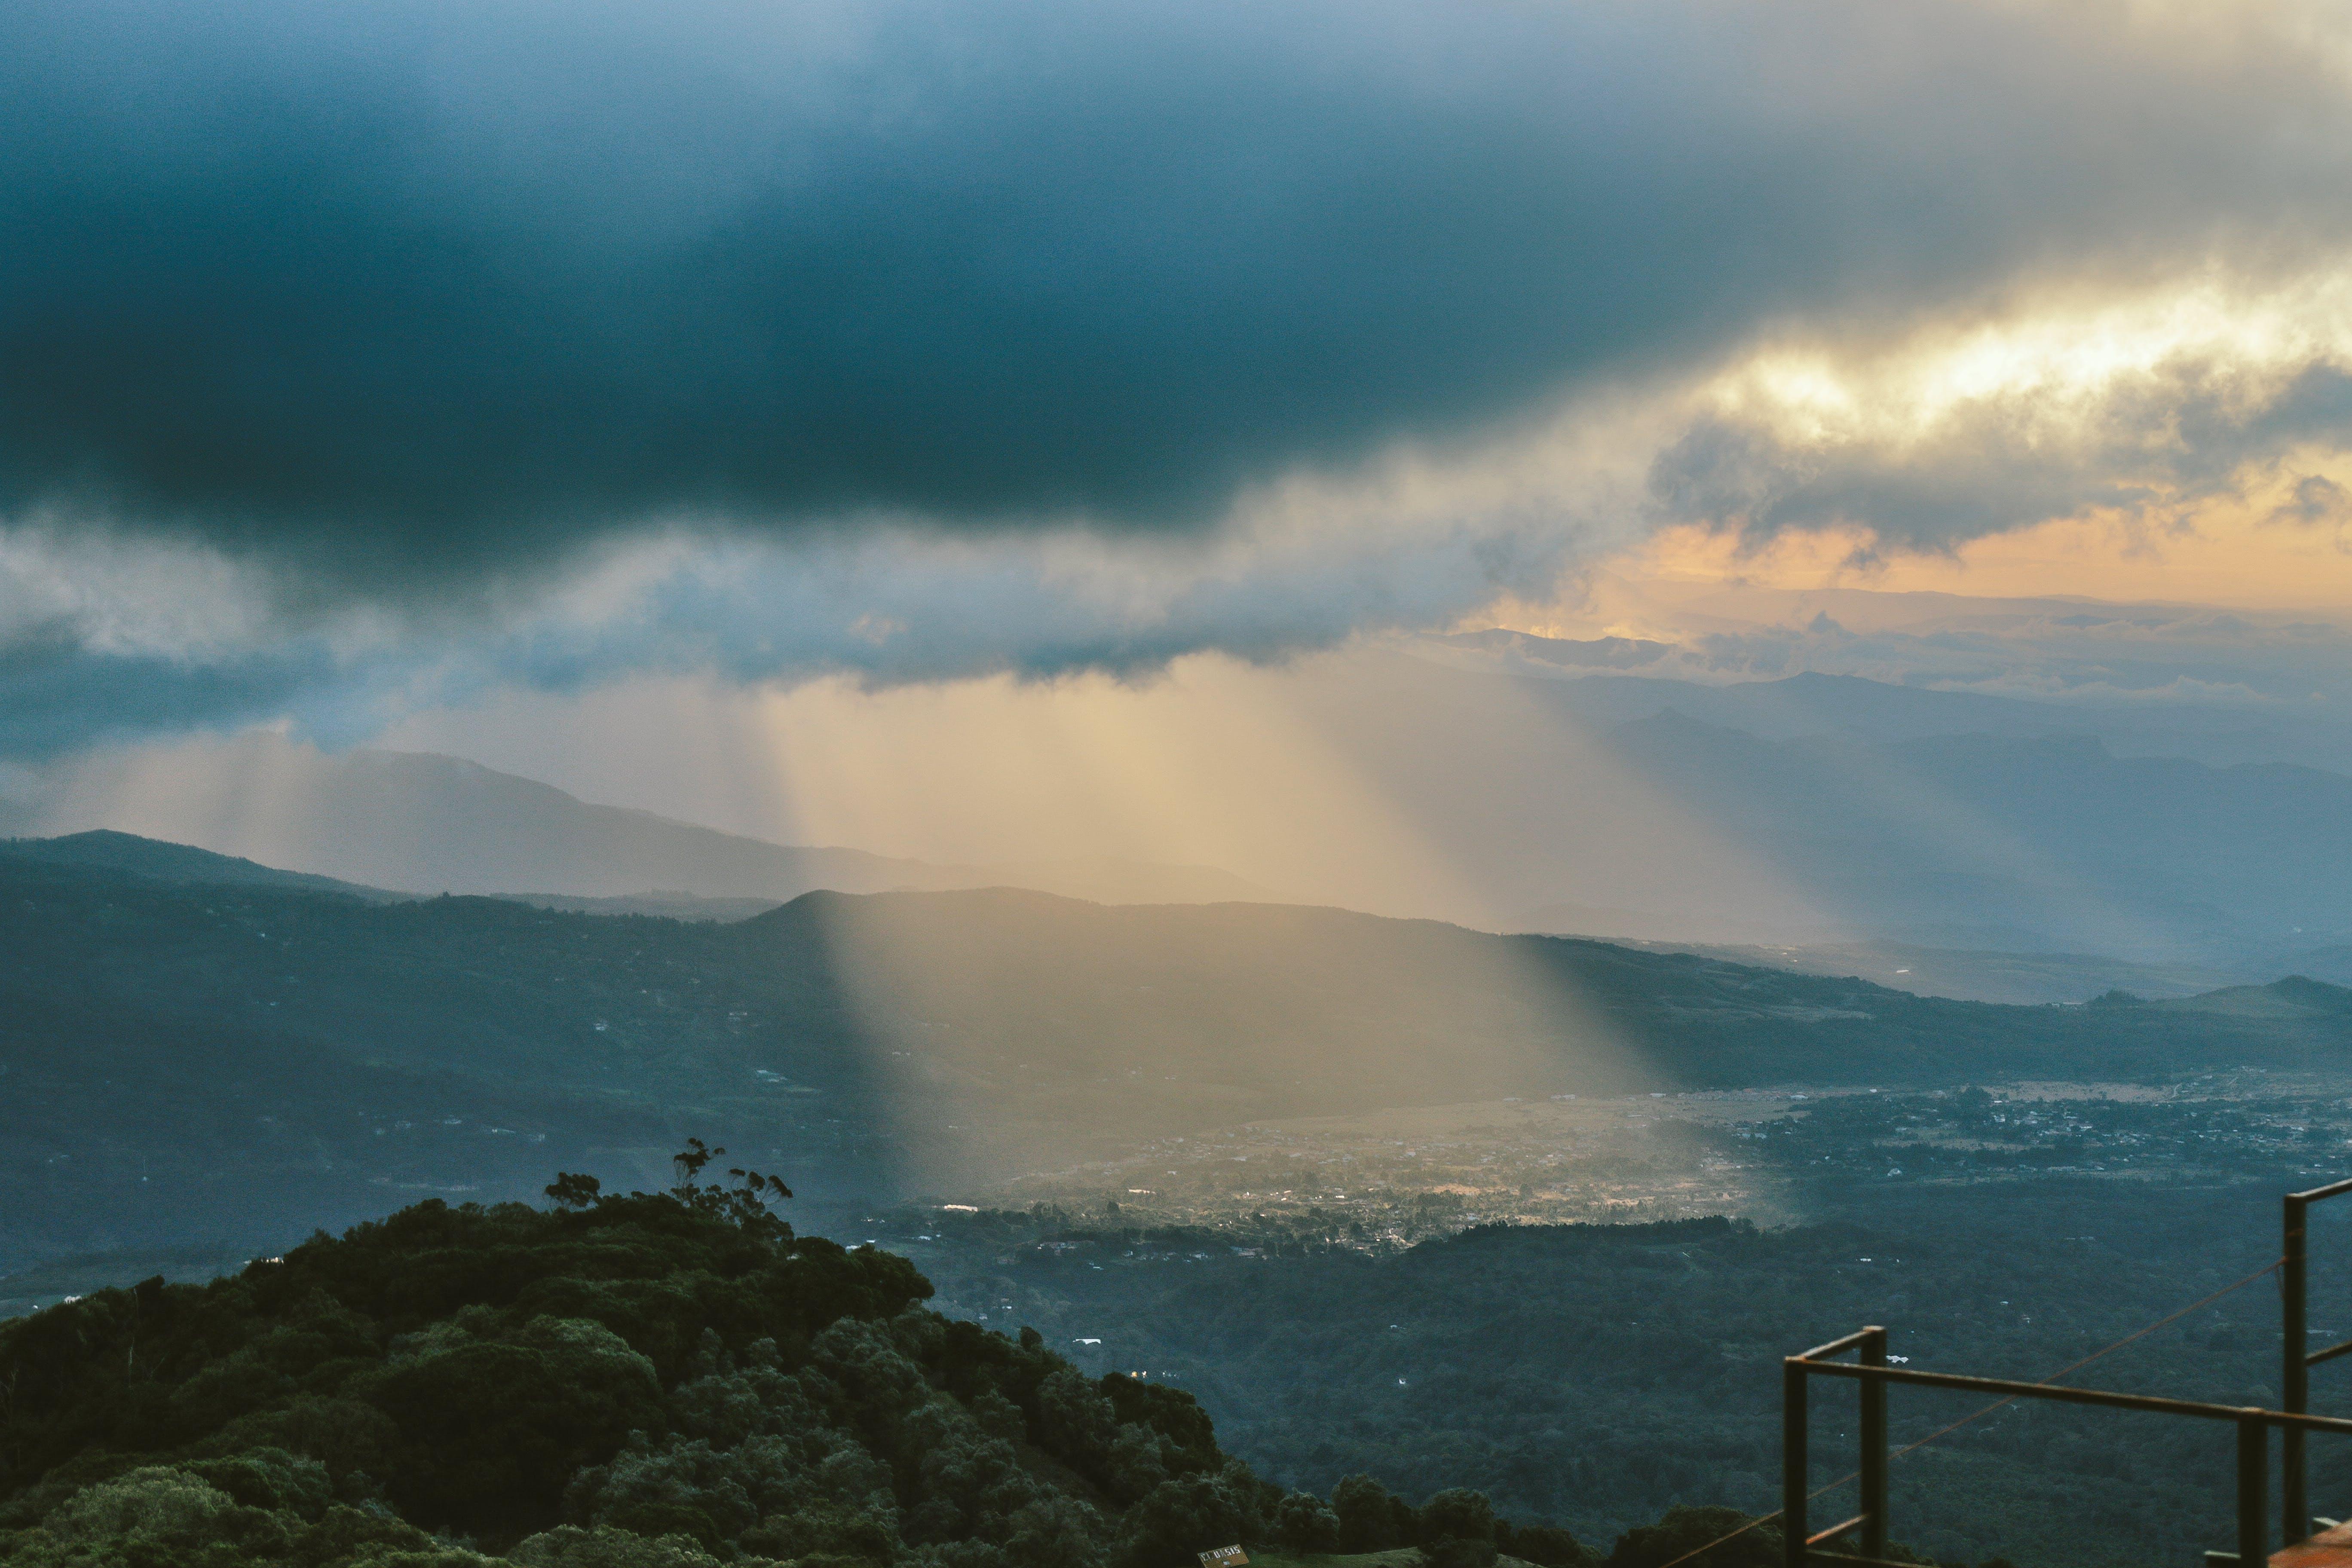 Sunlight Beaming Through Clouds